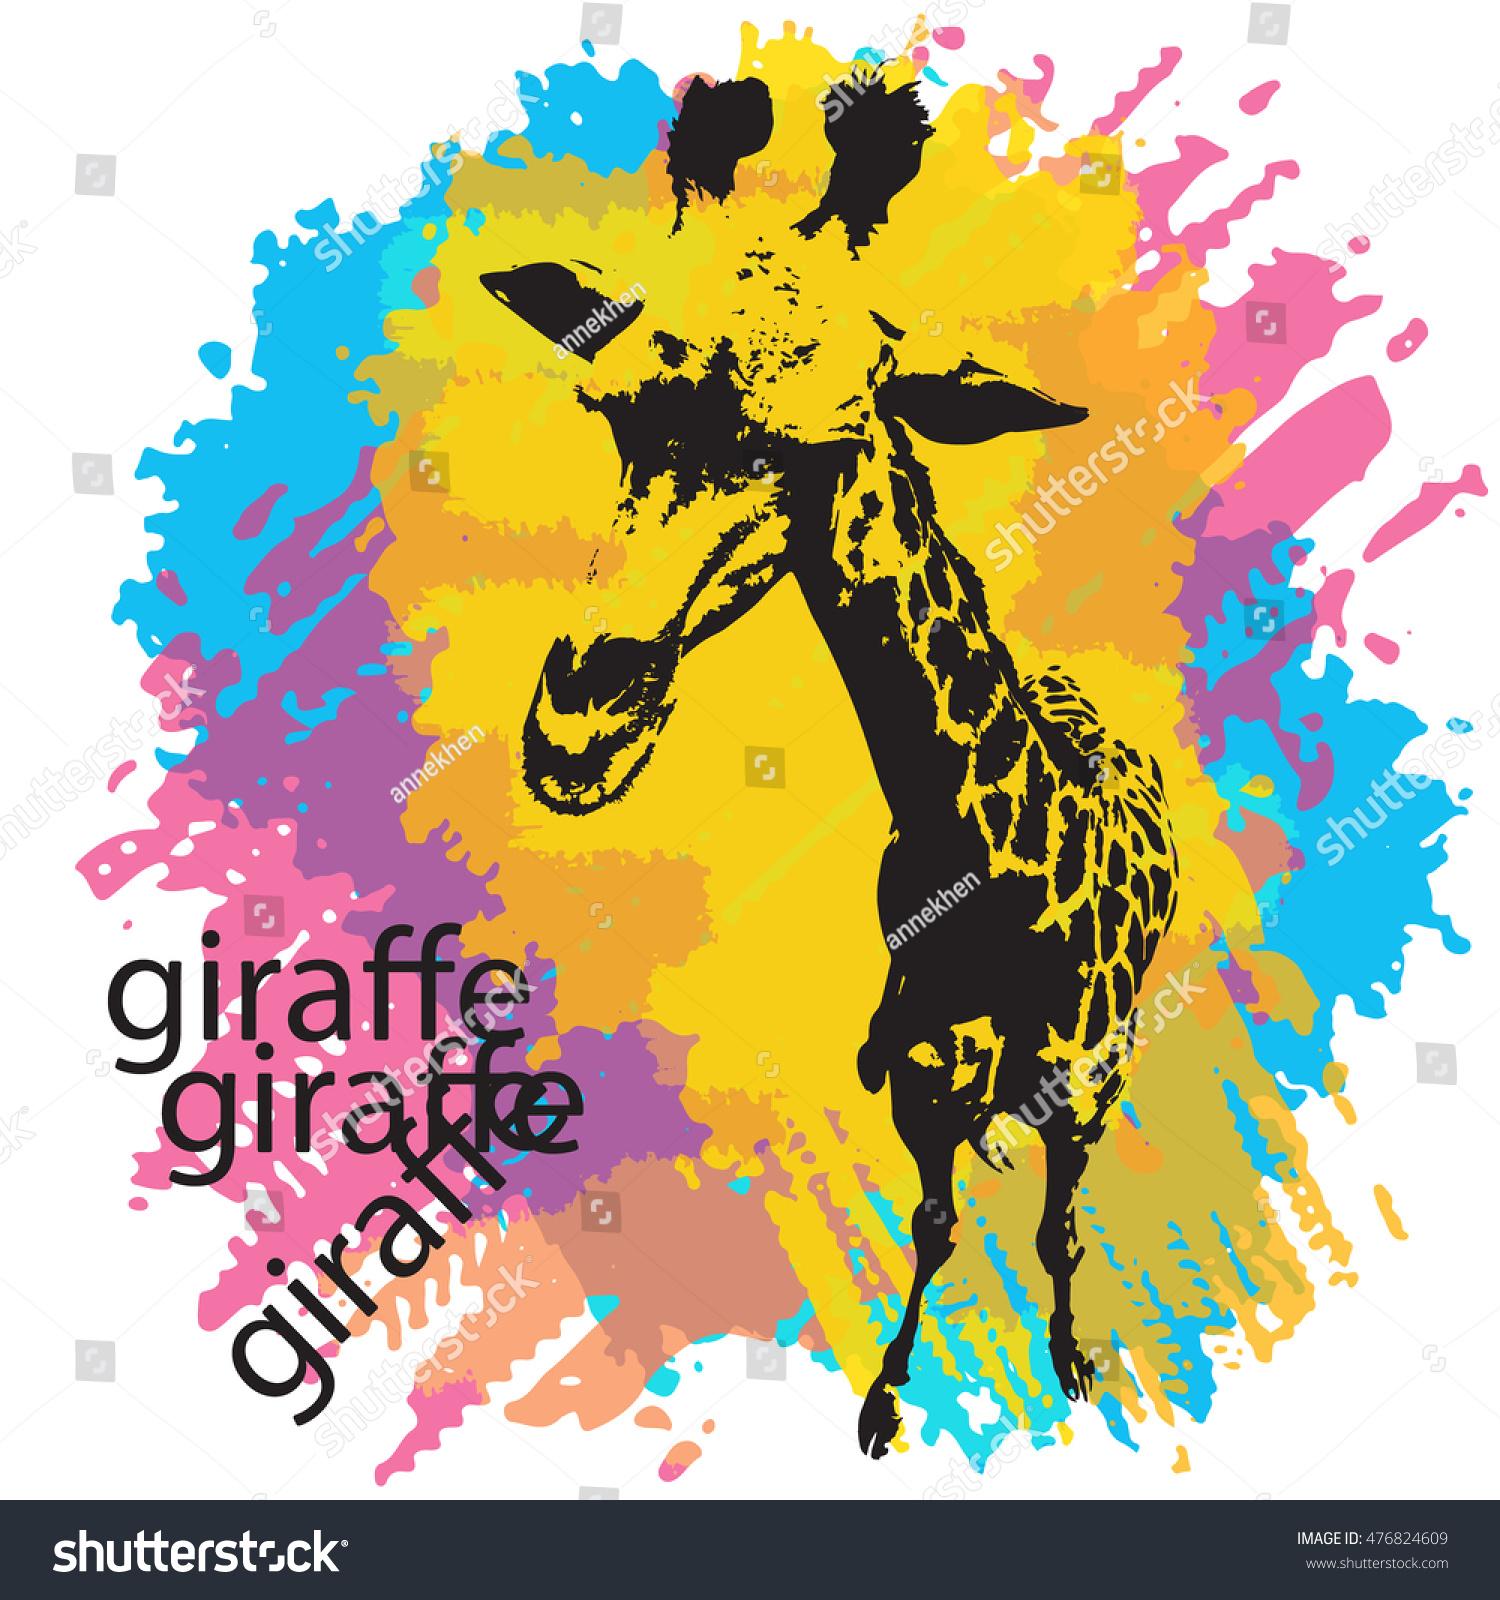 design templates vectors vector artwork wwwresume formatcom stock vector vector illustration of giraffe silhouette on background - Wwwresume Formatcom